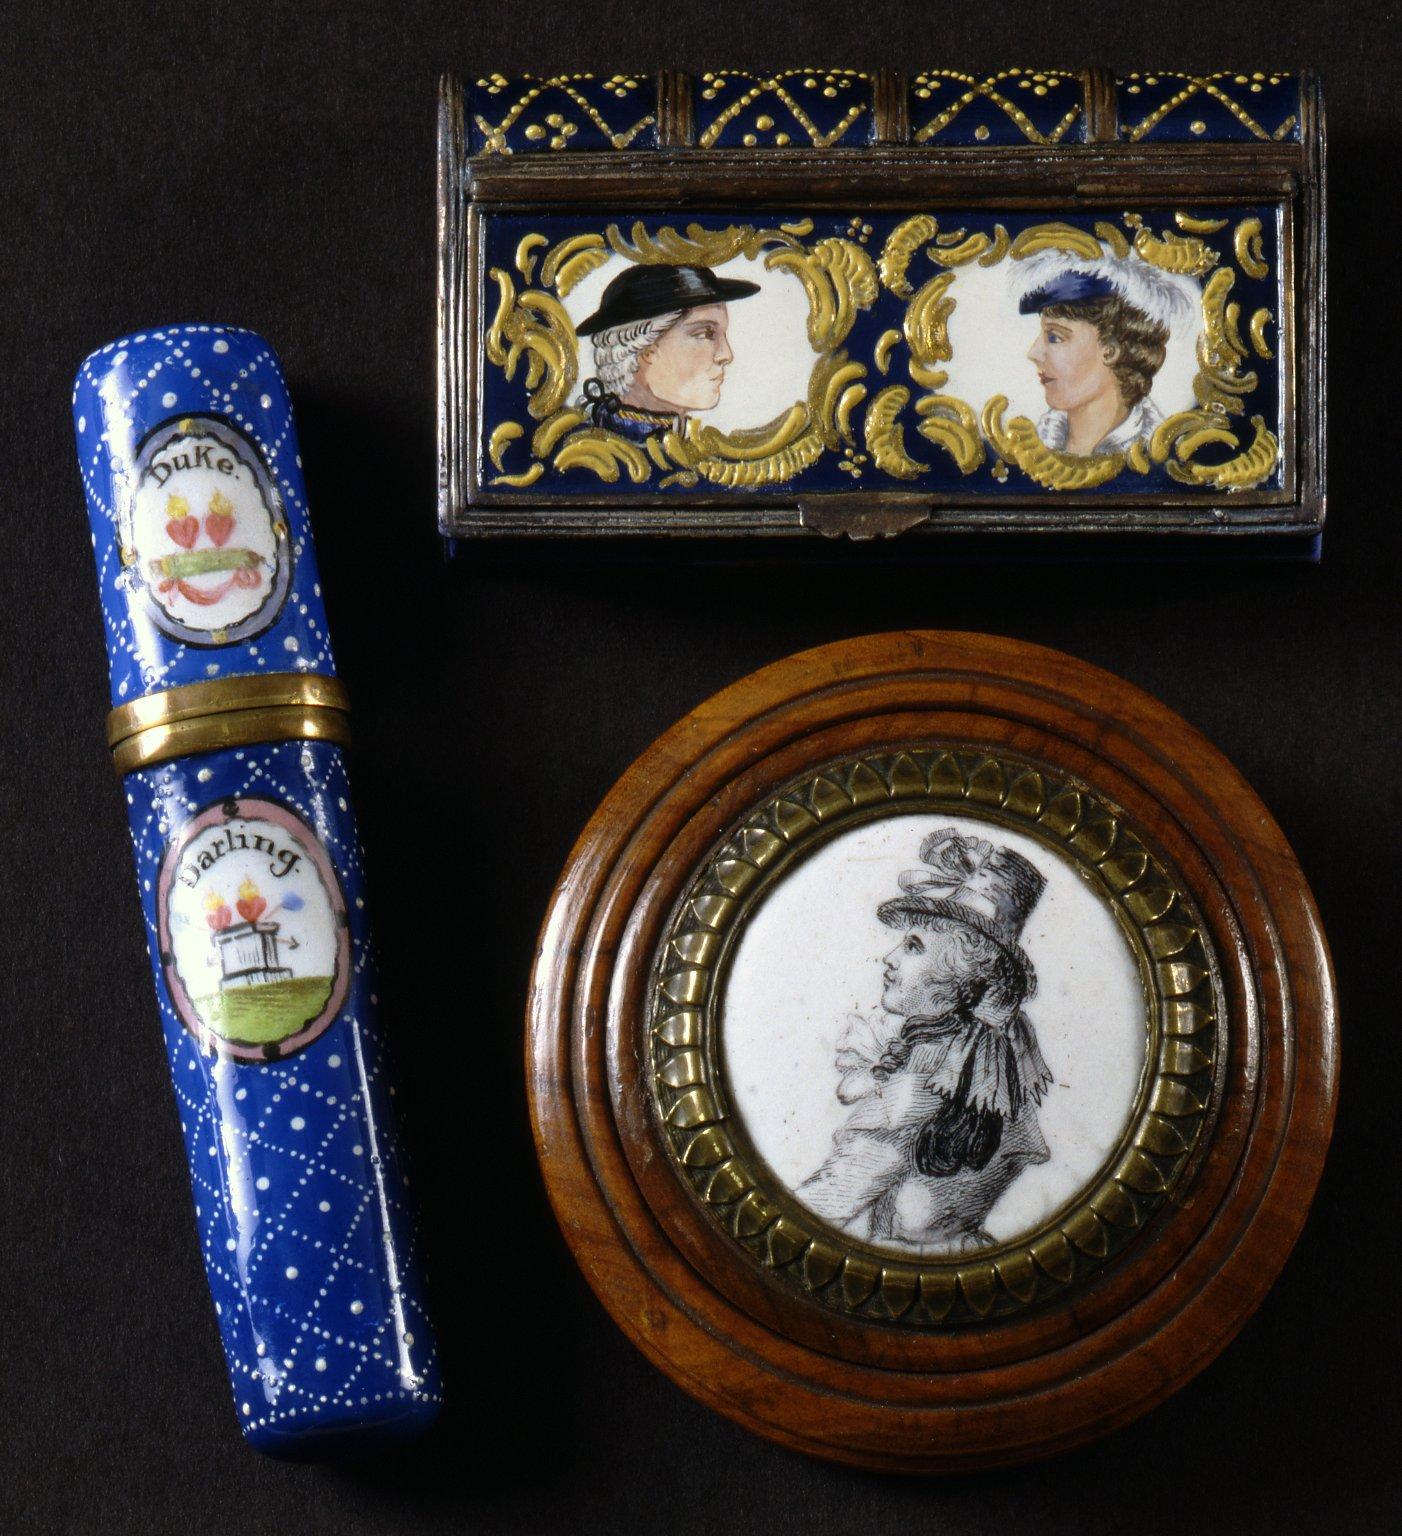 Bilston enamel porcelains